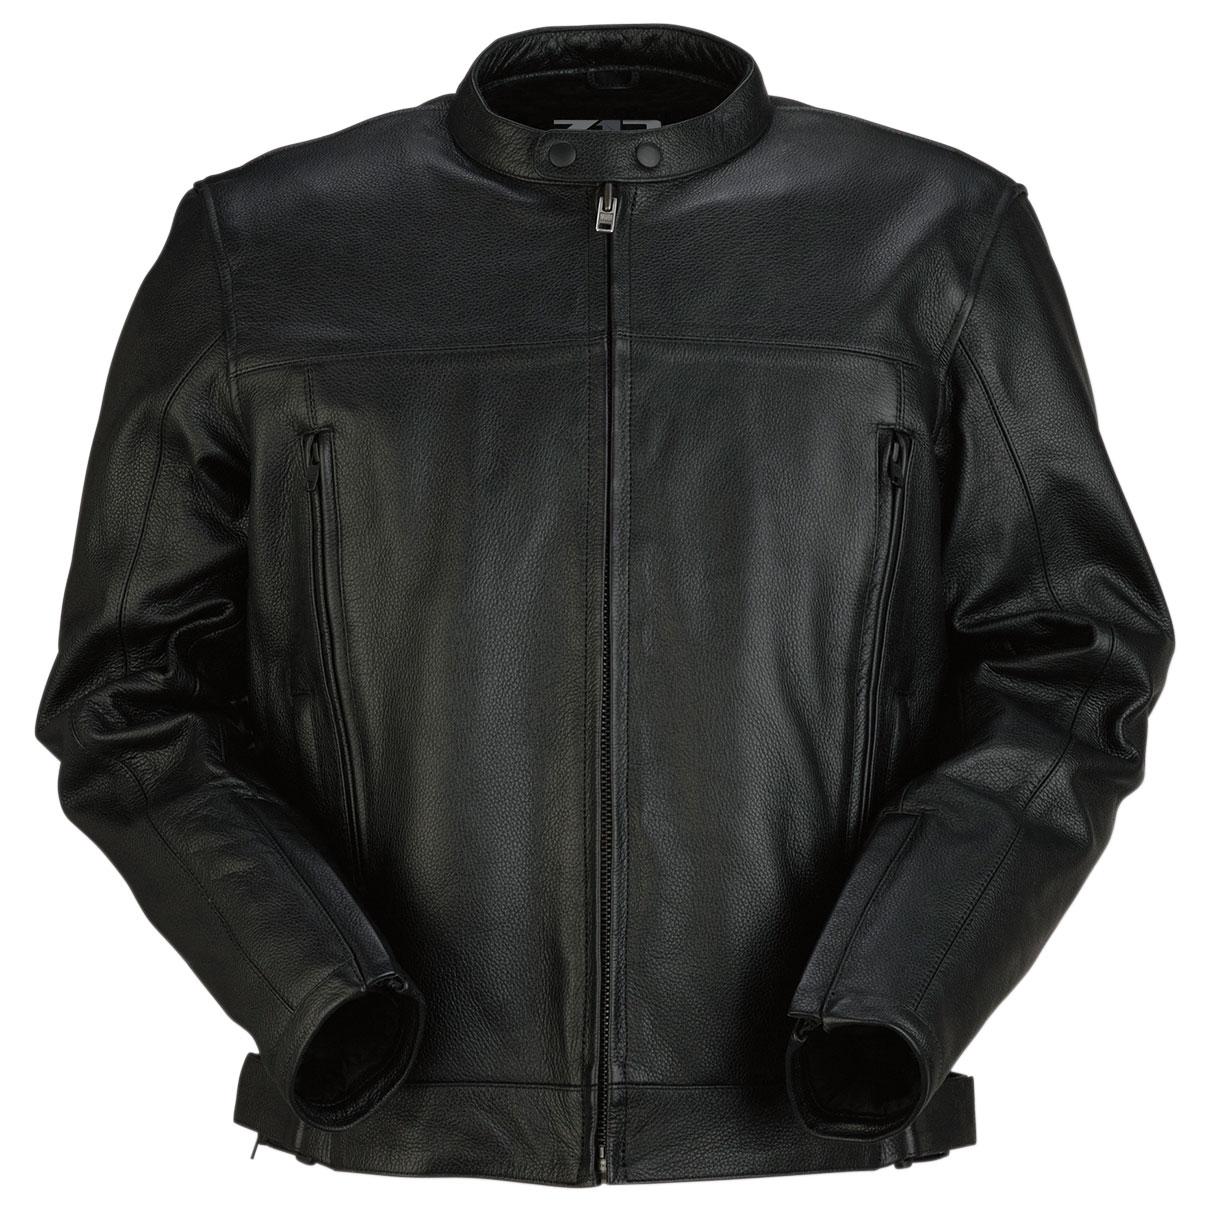 Z1R Men's Arsenal Black Leather Jacket